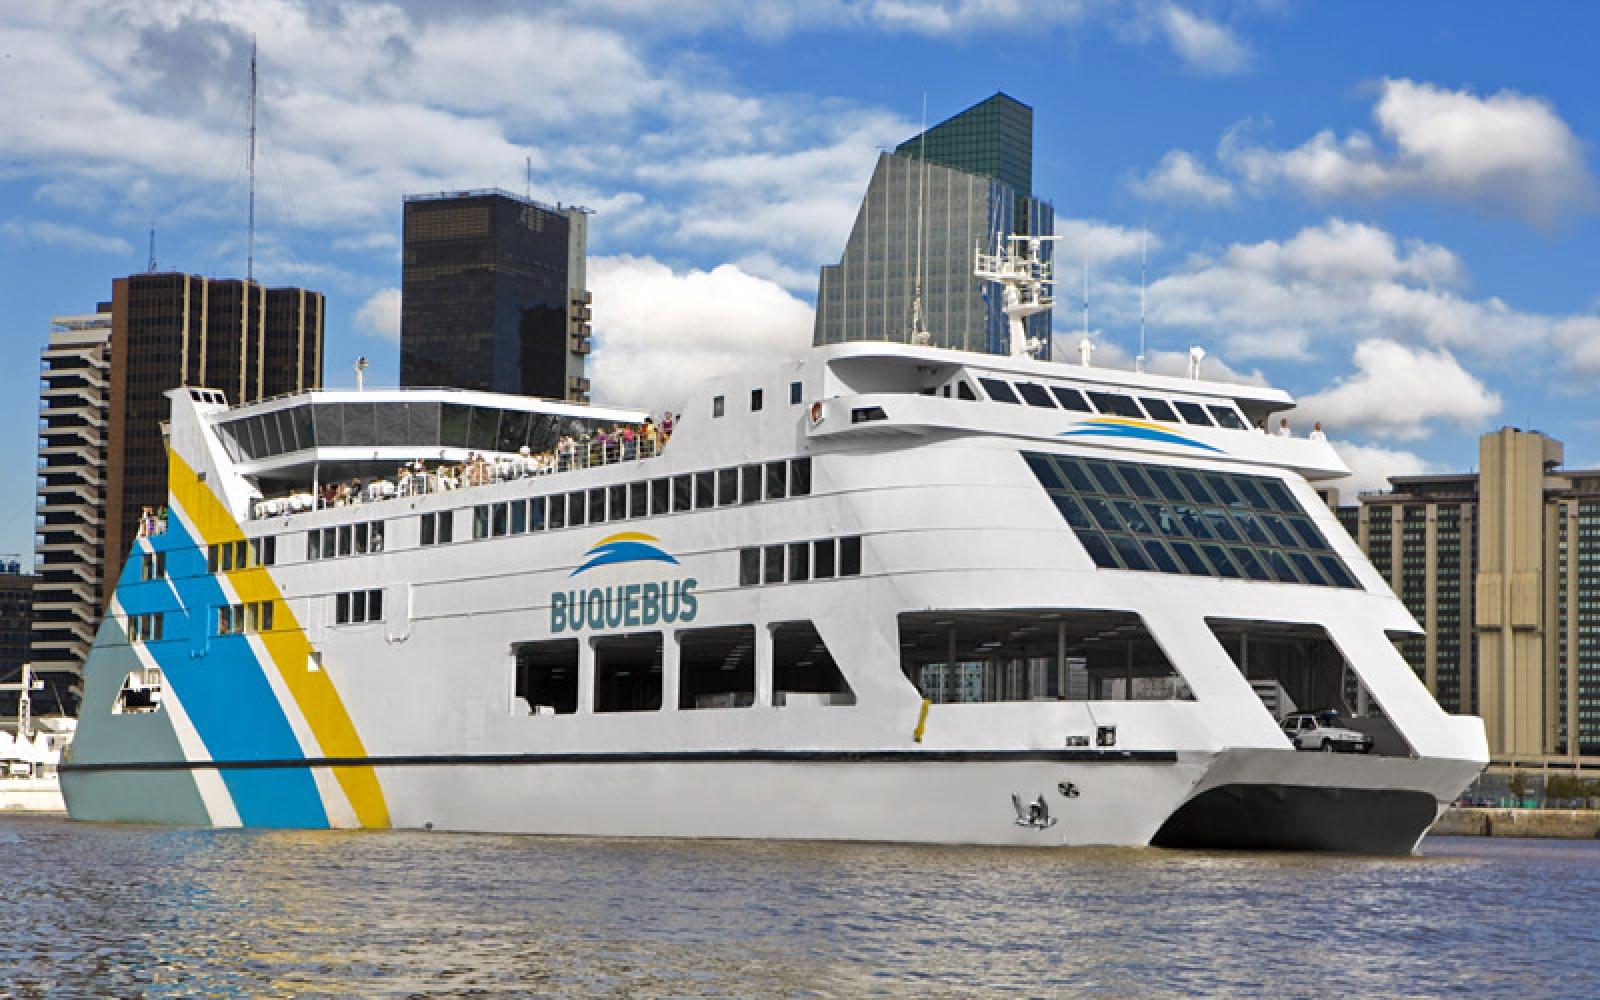 buienos aires montevideo buquebus ferry